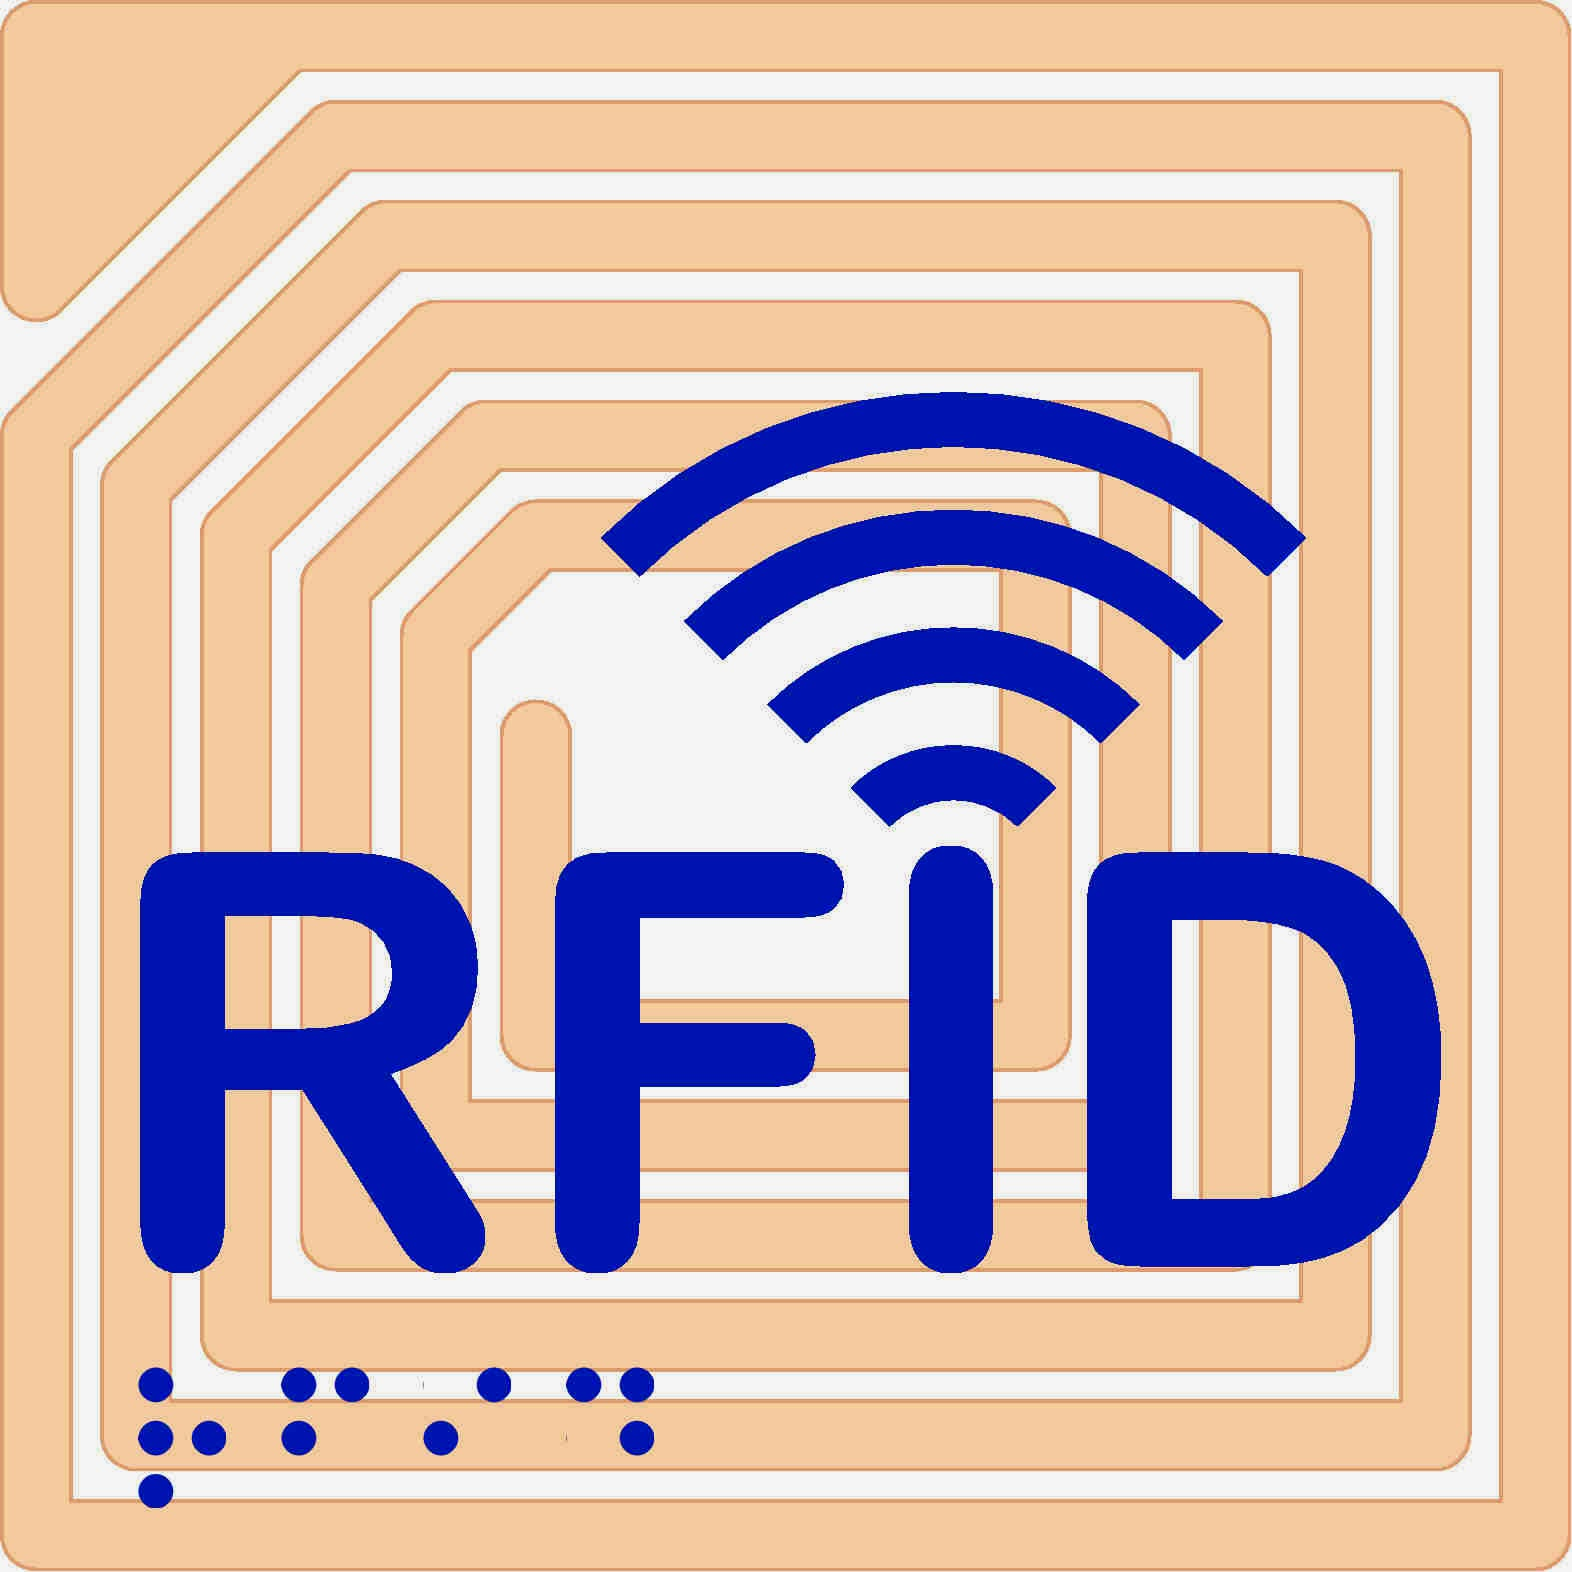 rfid маркарян